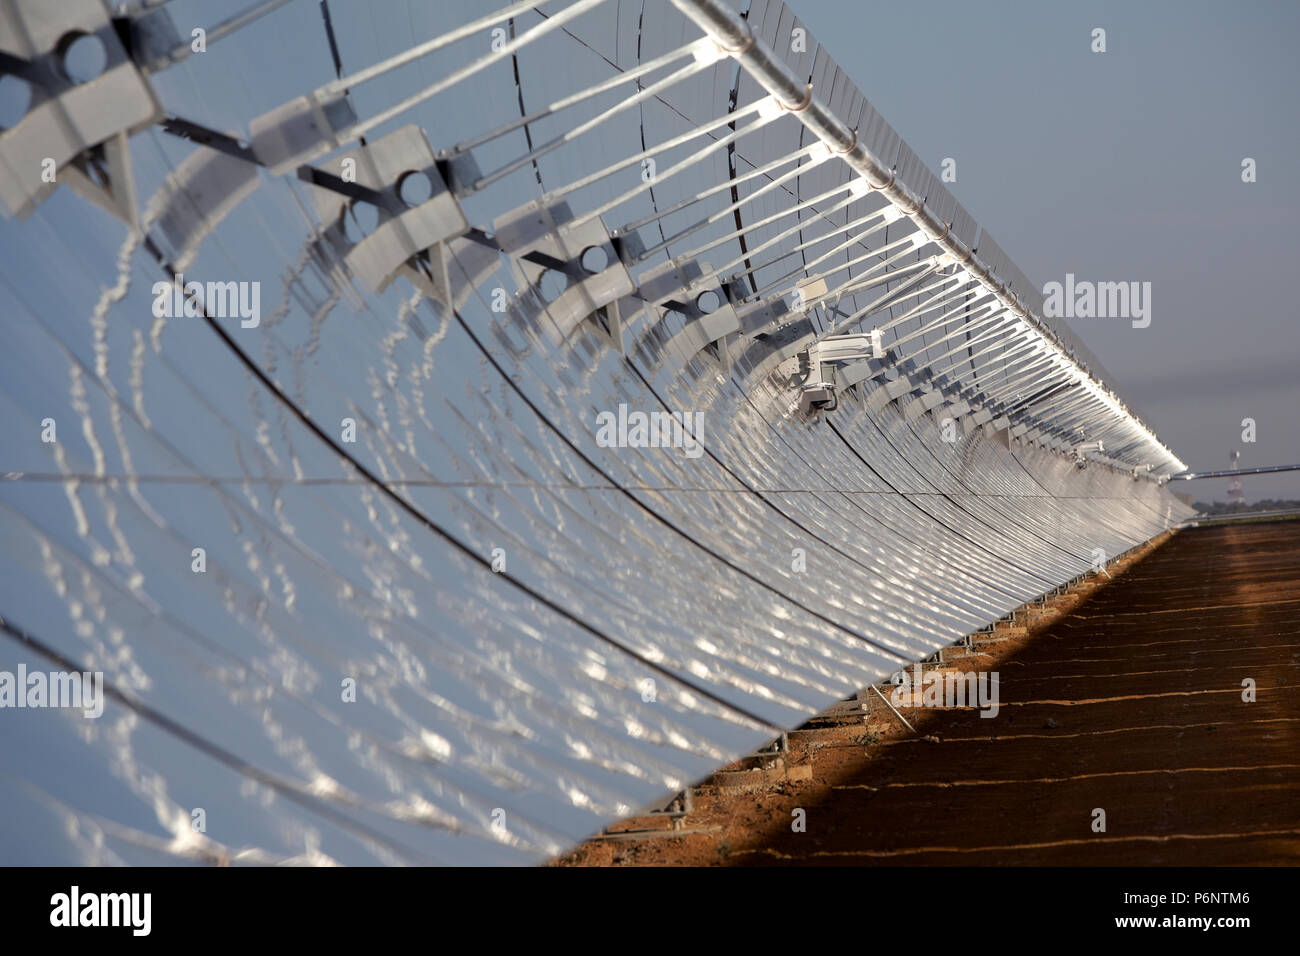 Concave Mirror Technology Of The Solar Power Plant La Risca Near Badajoz Extremadura In Spain Stock Photo Alamy